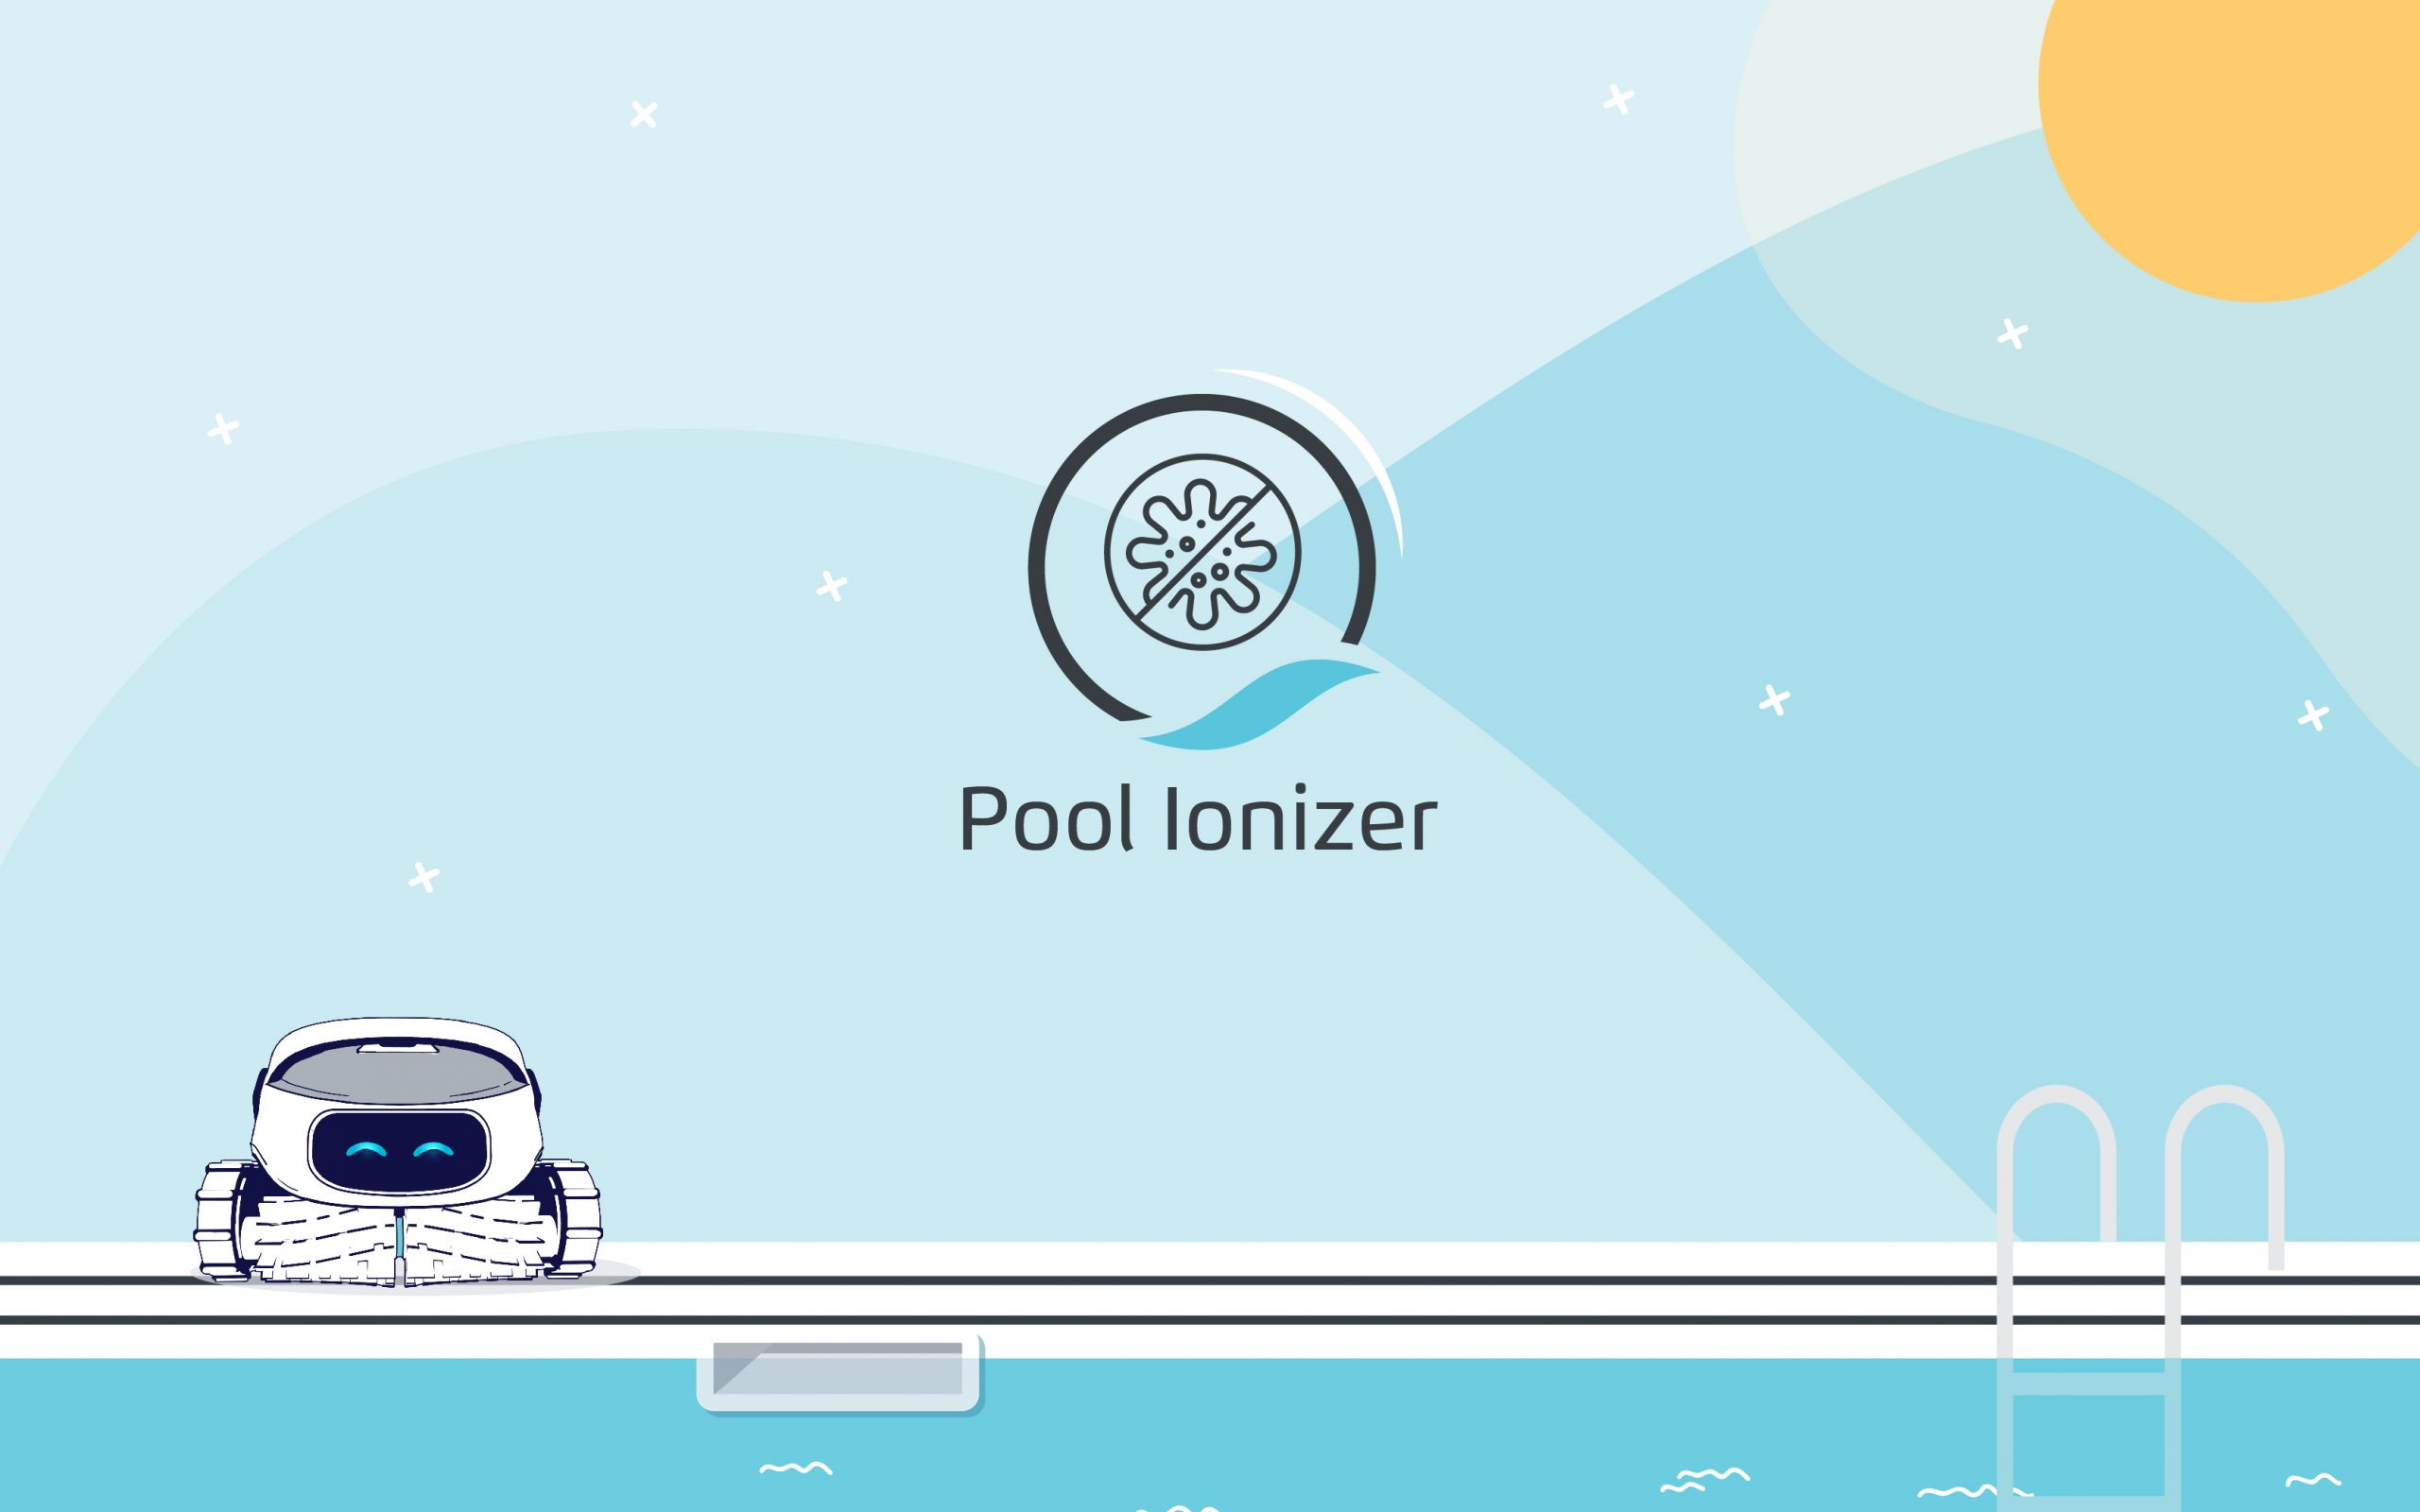 Pool Ionizer